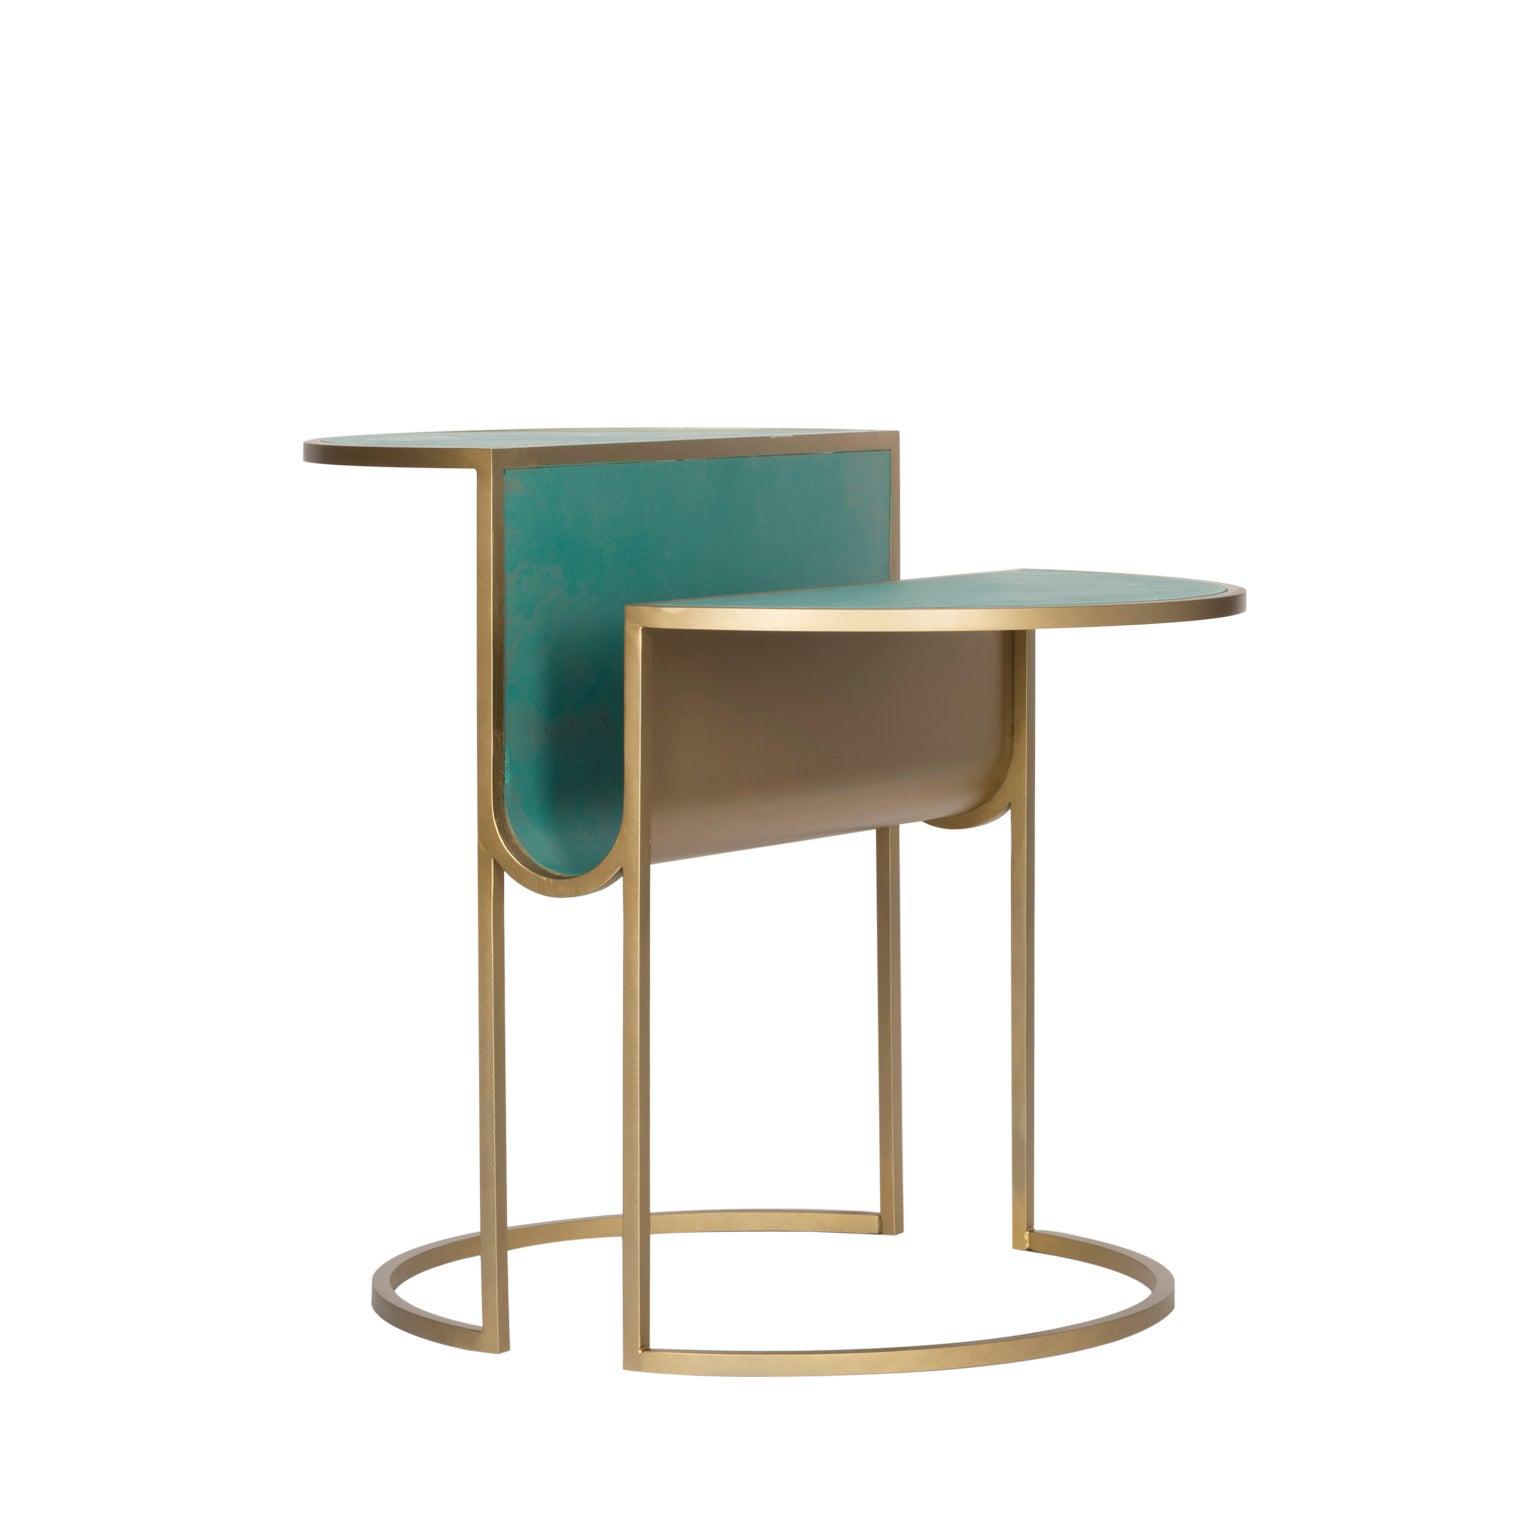 Orbit Tea Table in Verdigris Copper and Brass Coated Steel by Lara Bohinc